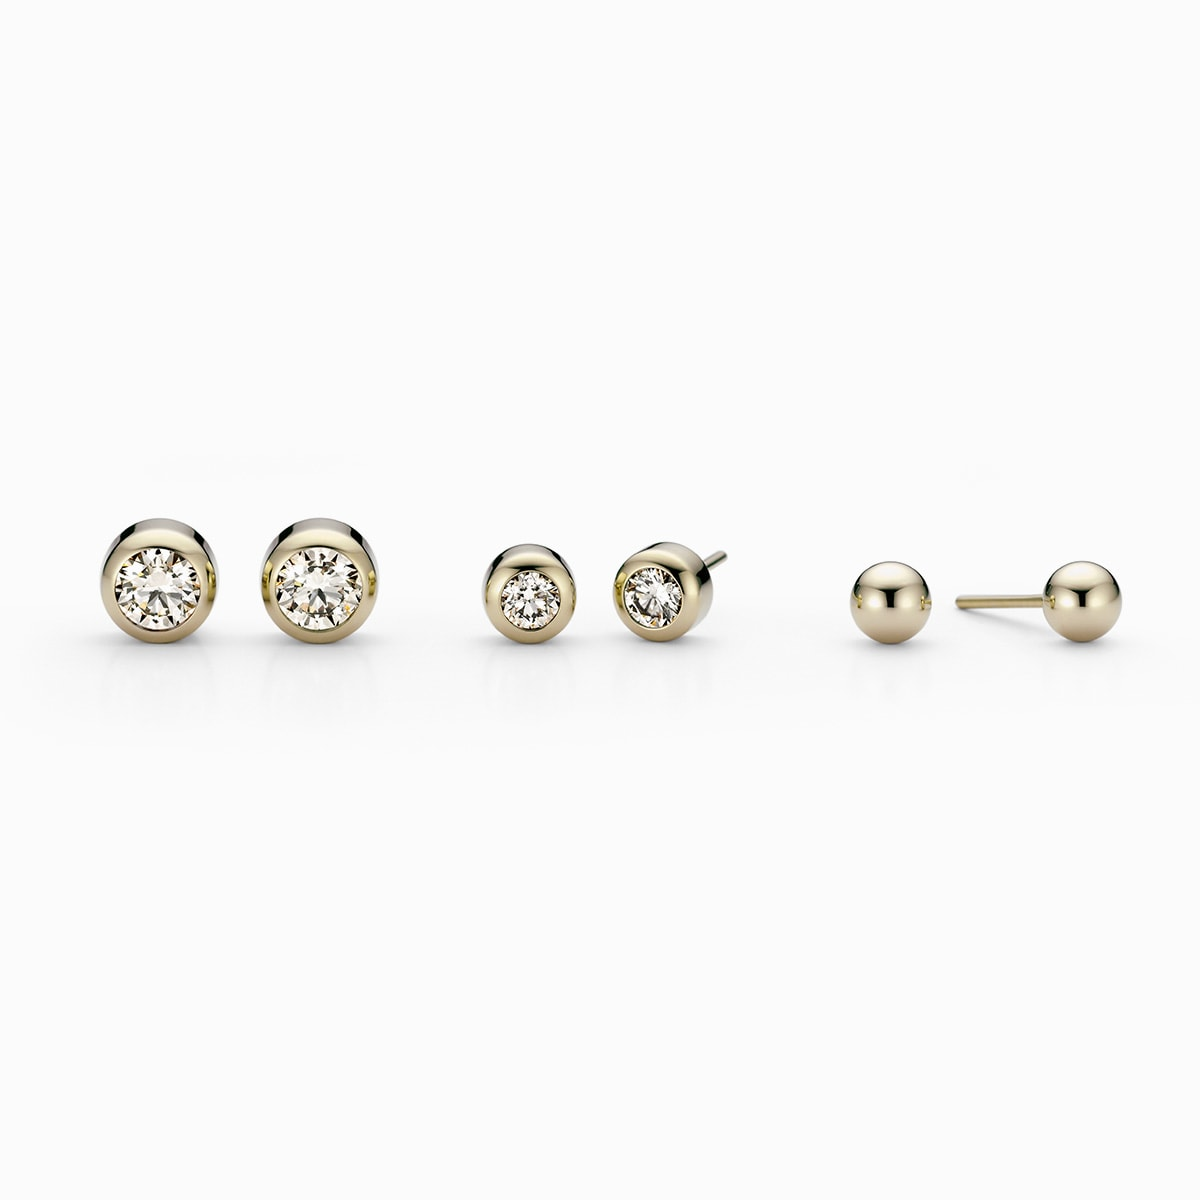 Niessing Diamond Accent Ear Jewelry